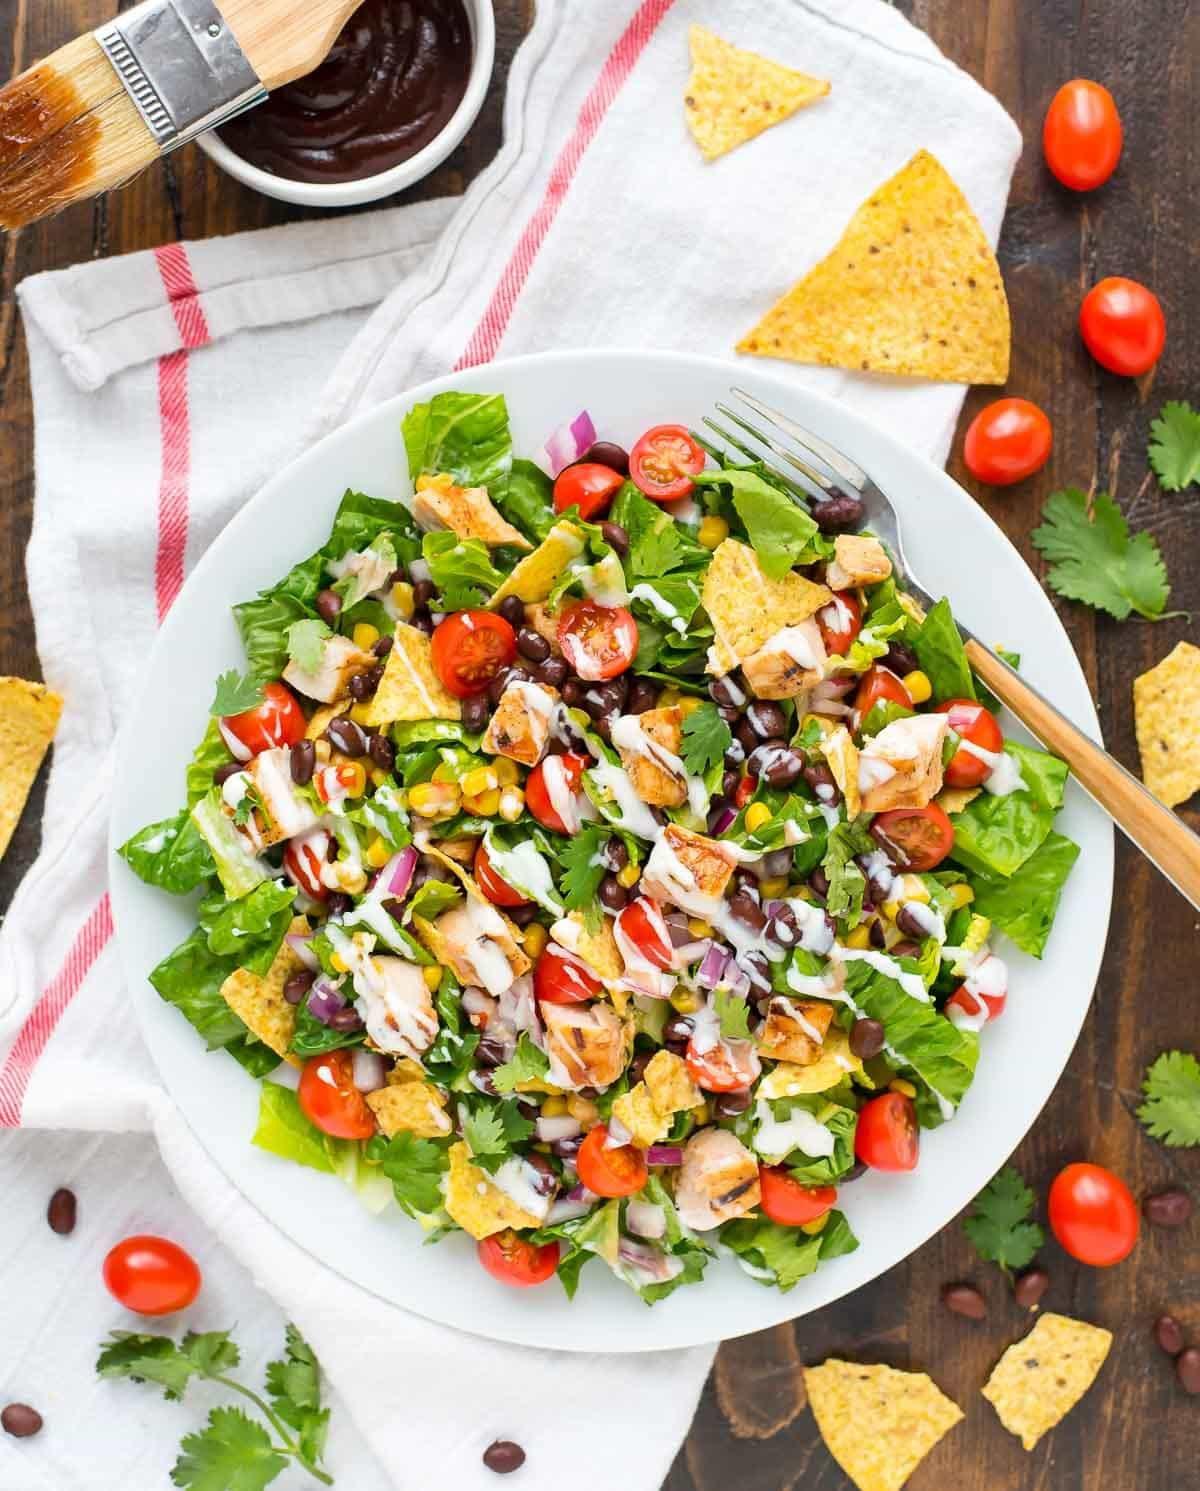 Healthy Chicken Salad Recipe  BBQ Chicken Salad with Creamy Ranch